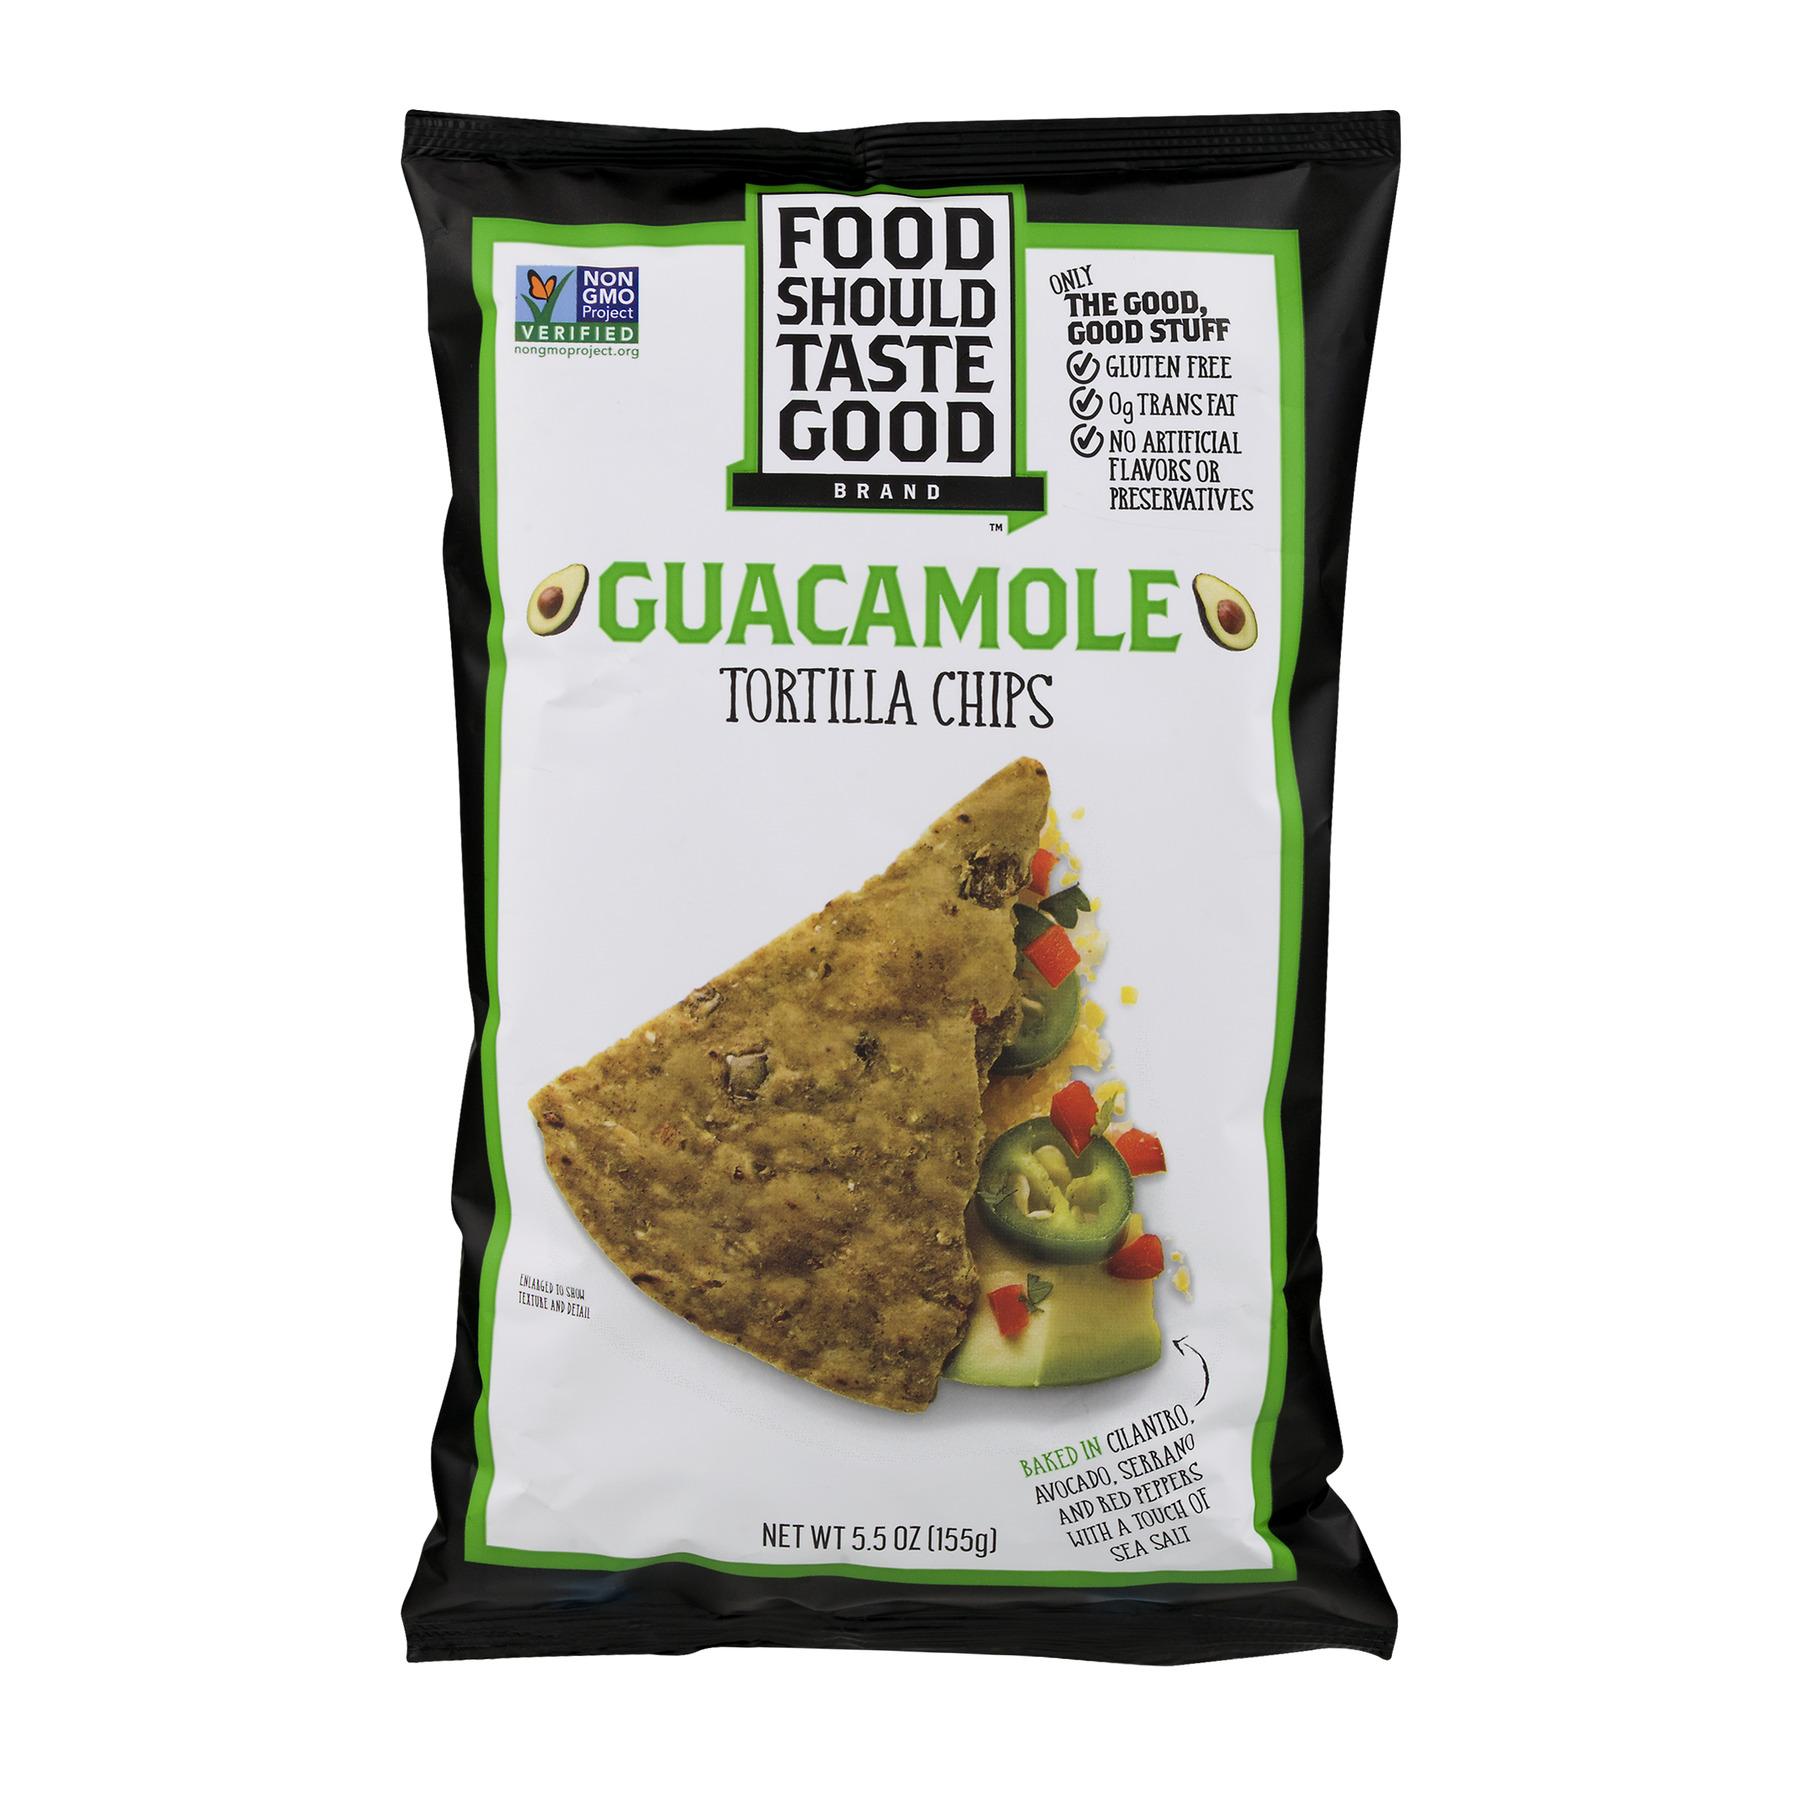 Food Should Taste Good ® Tortilla Chips Gluten Free non - GMO Guacamole 5.5 oz Bag